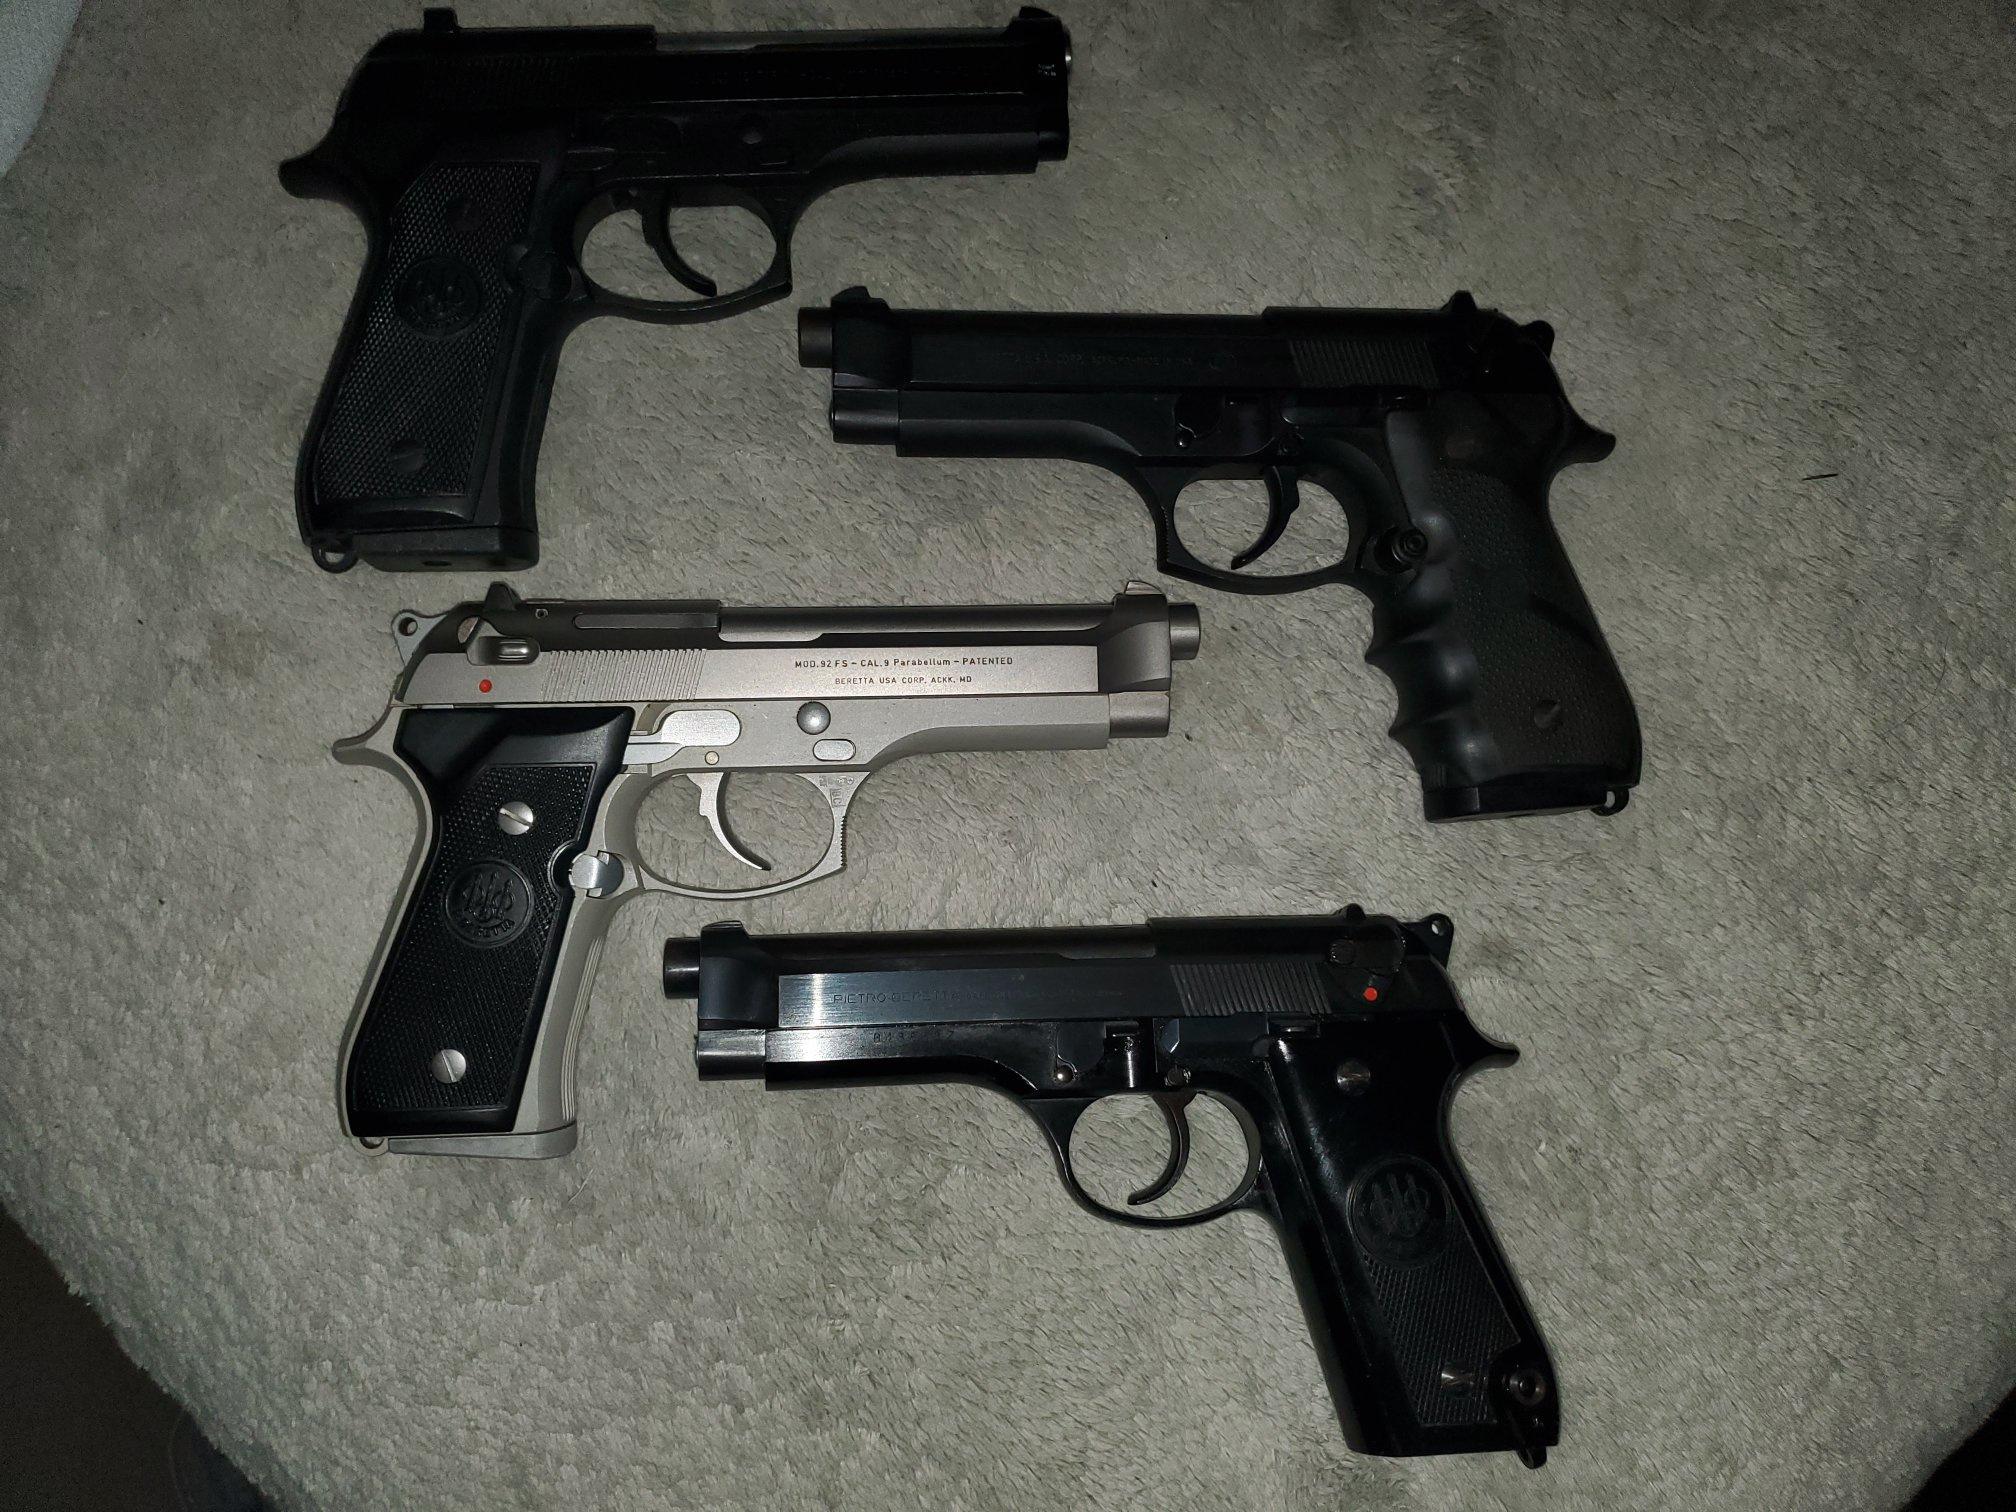 1998 Beretta Law Enforcement Program Brochure